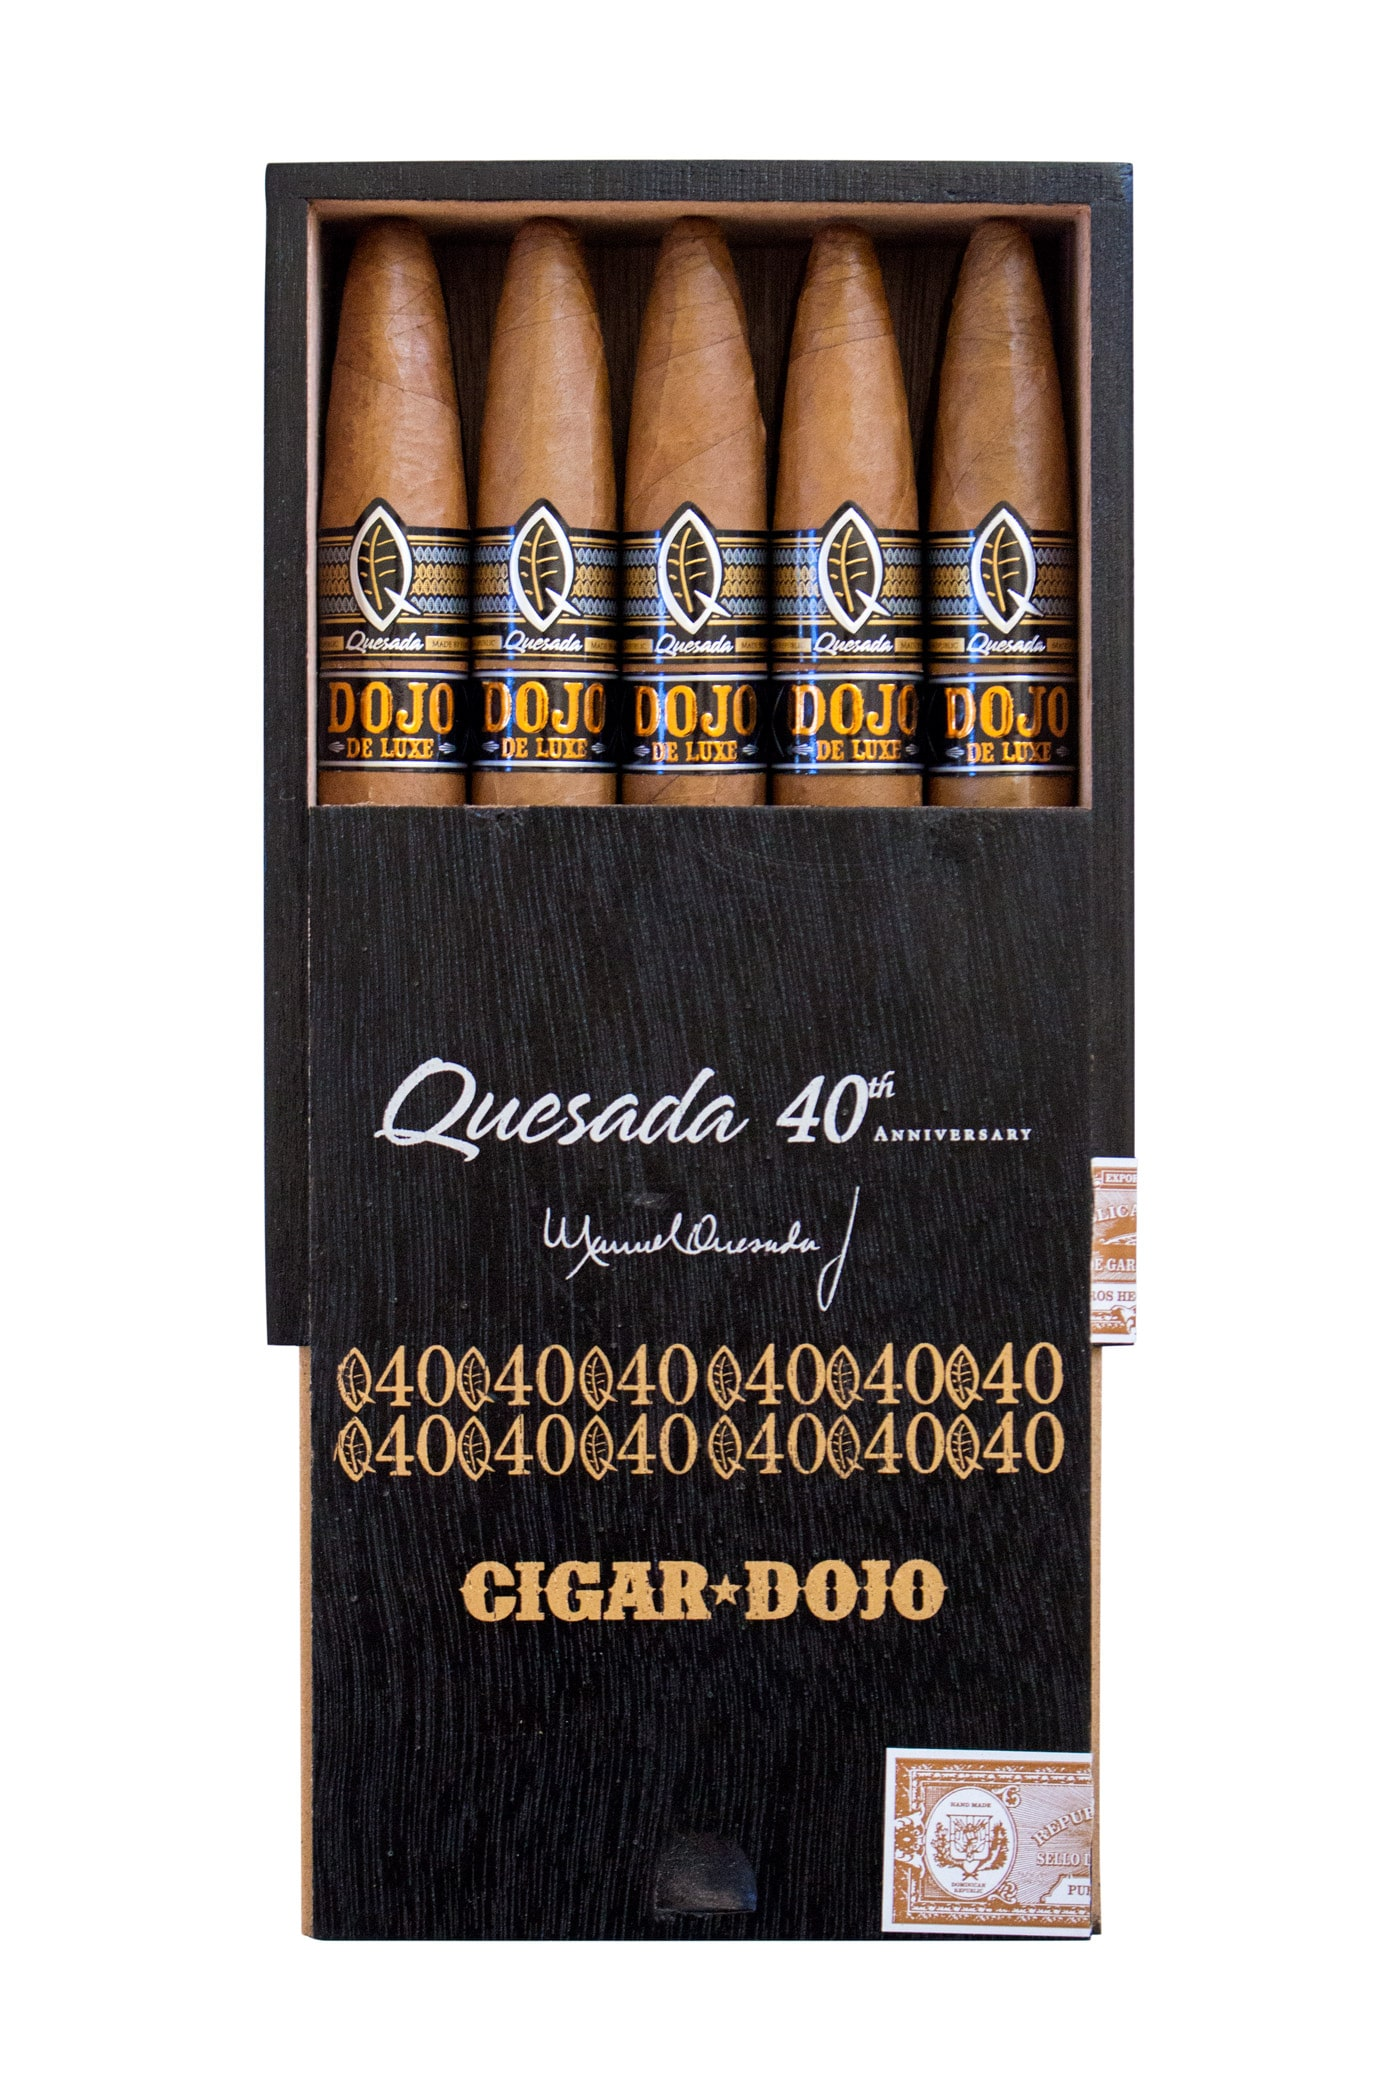 Quesada Dojo de Luxe cigar packaging open box